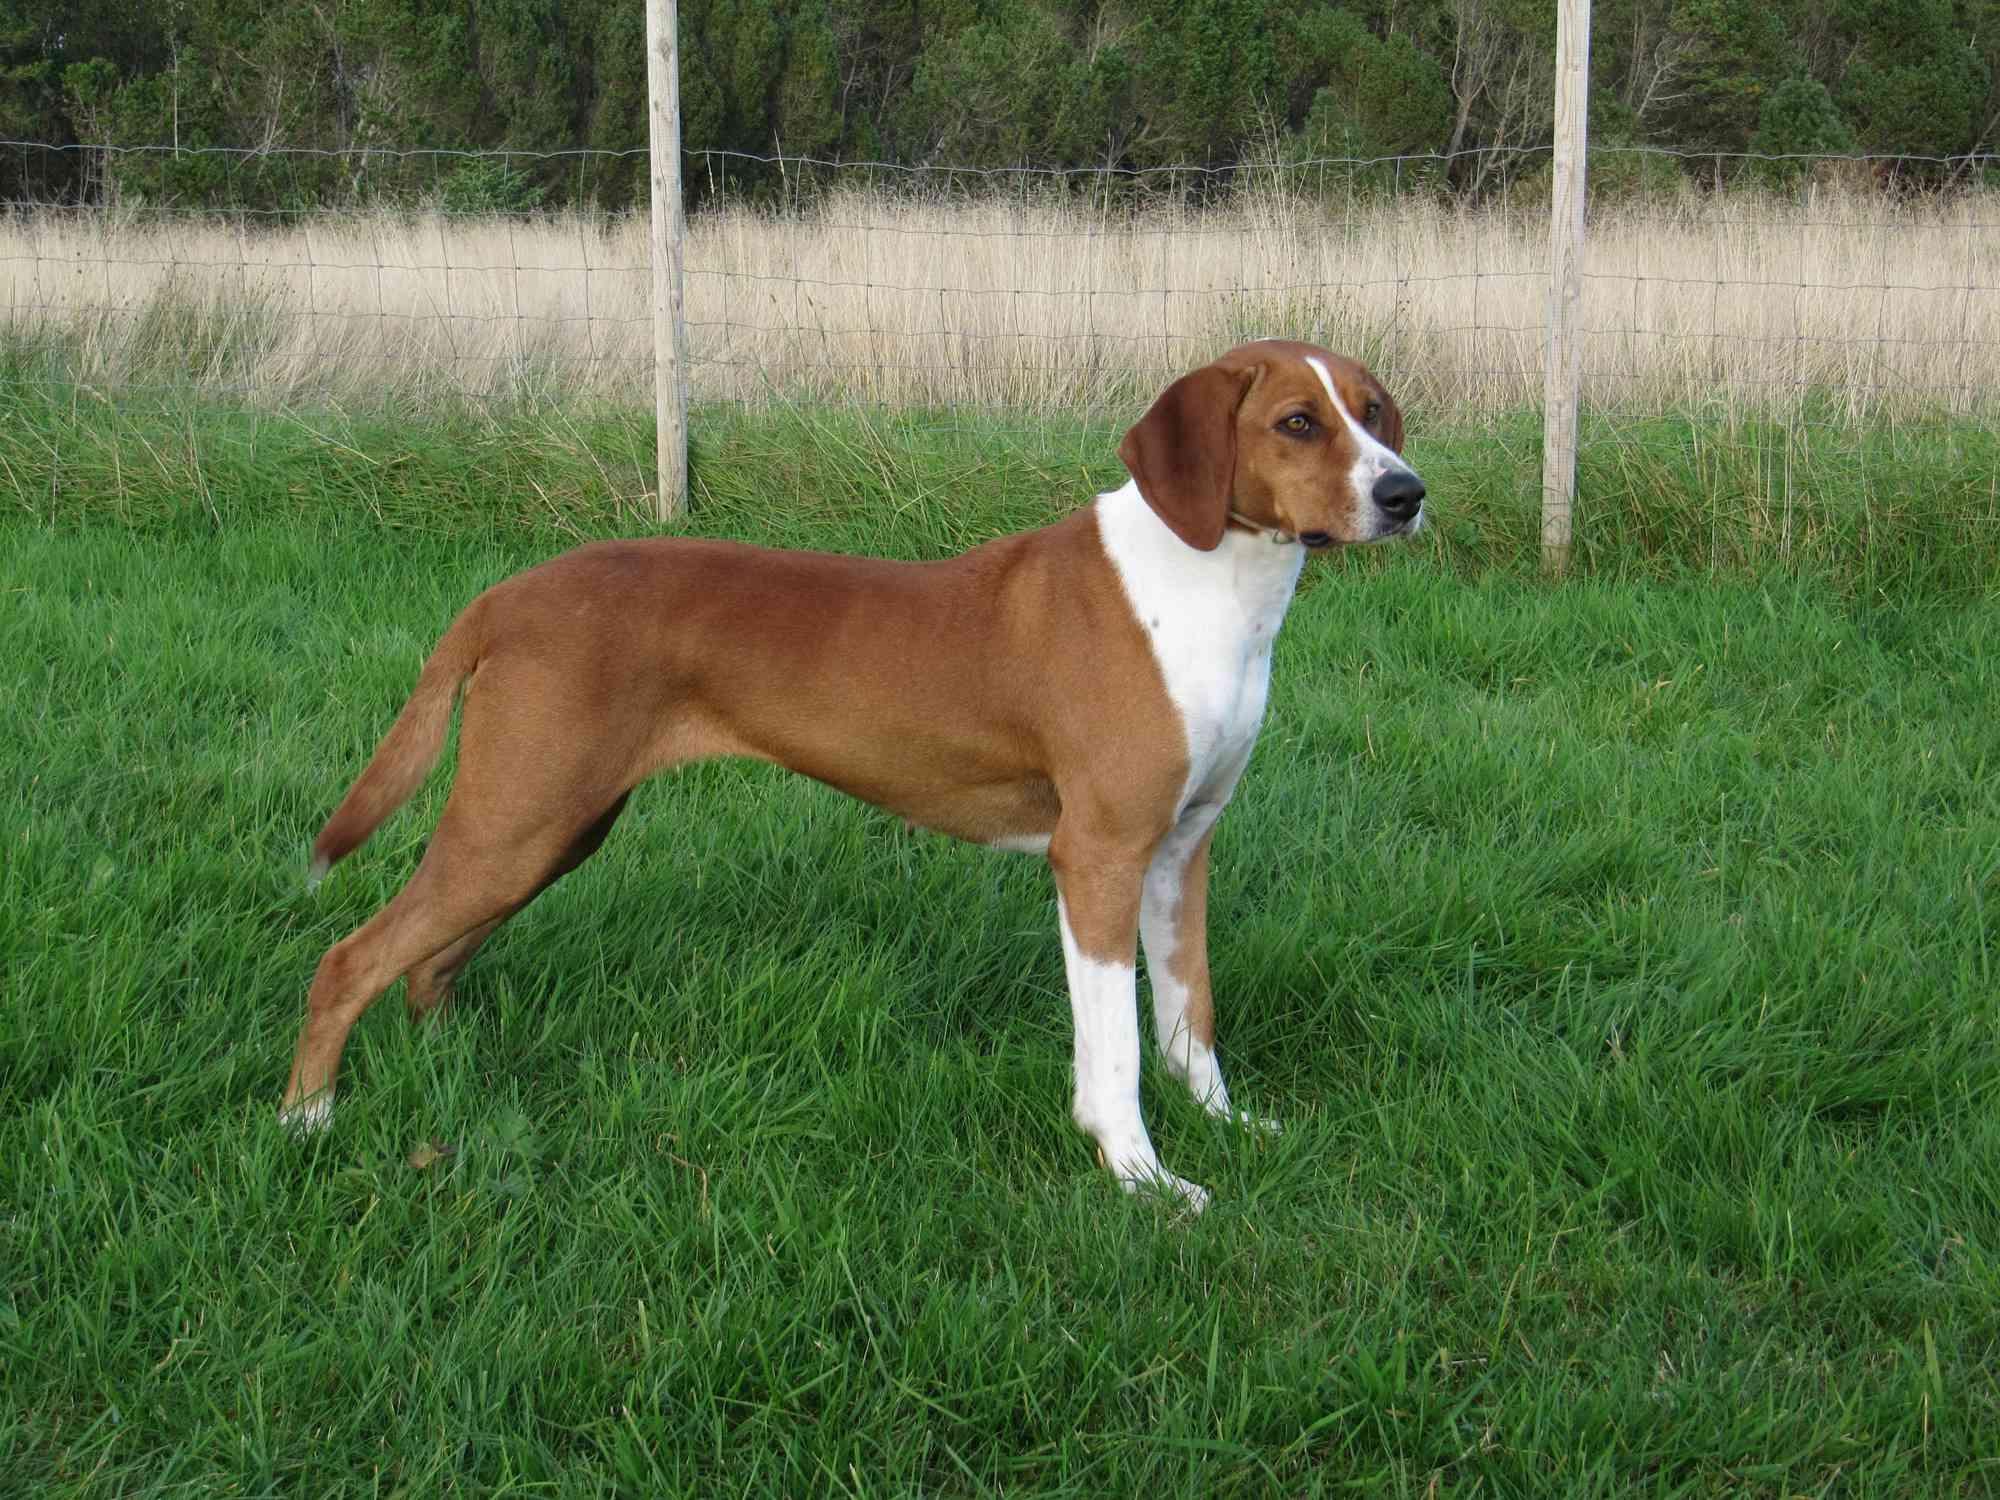 Norwegian Hygenhound standing on grass in a field